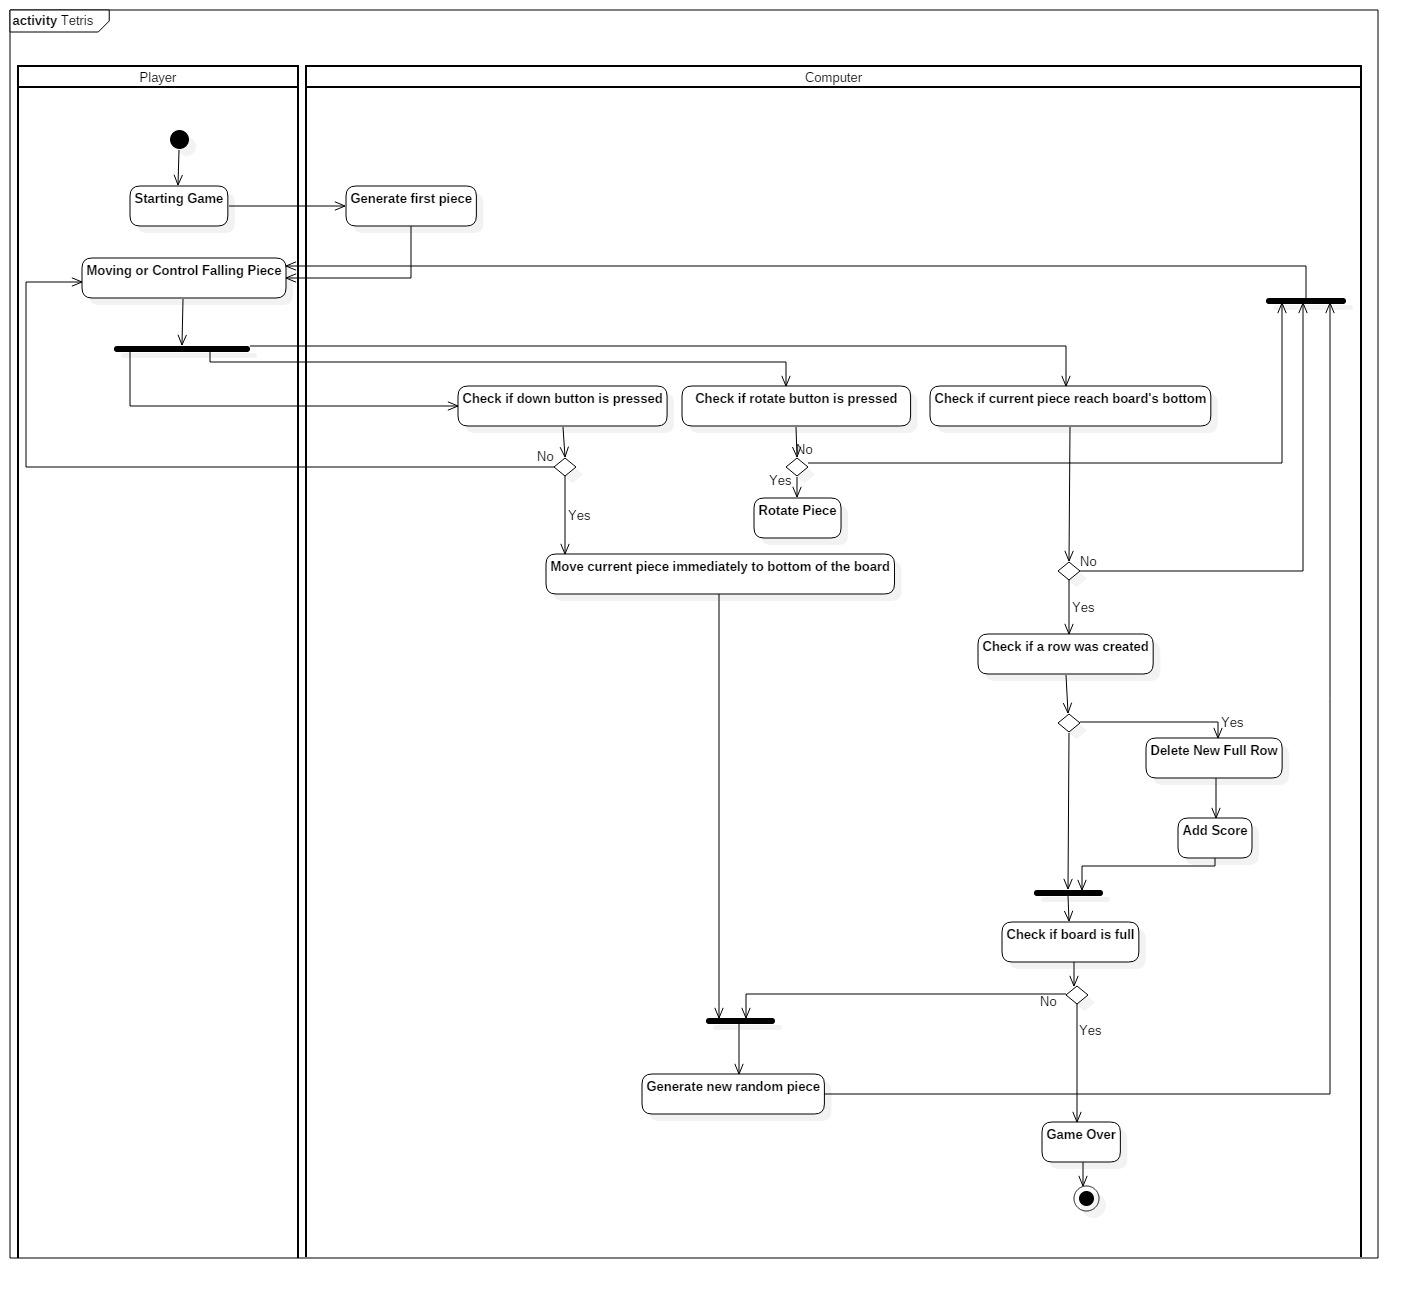 Aku dan tc sequence diagram class diagram crc card use case gambar full size dapat dilihat di githubantoniuskevinpplkelasc ccuart Gallery